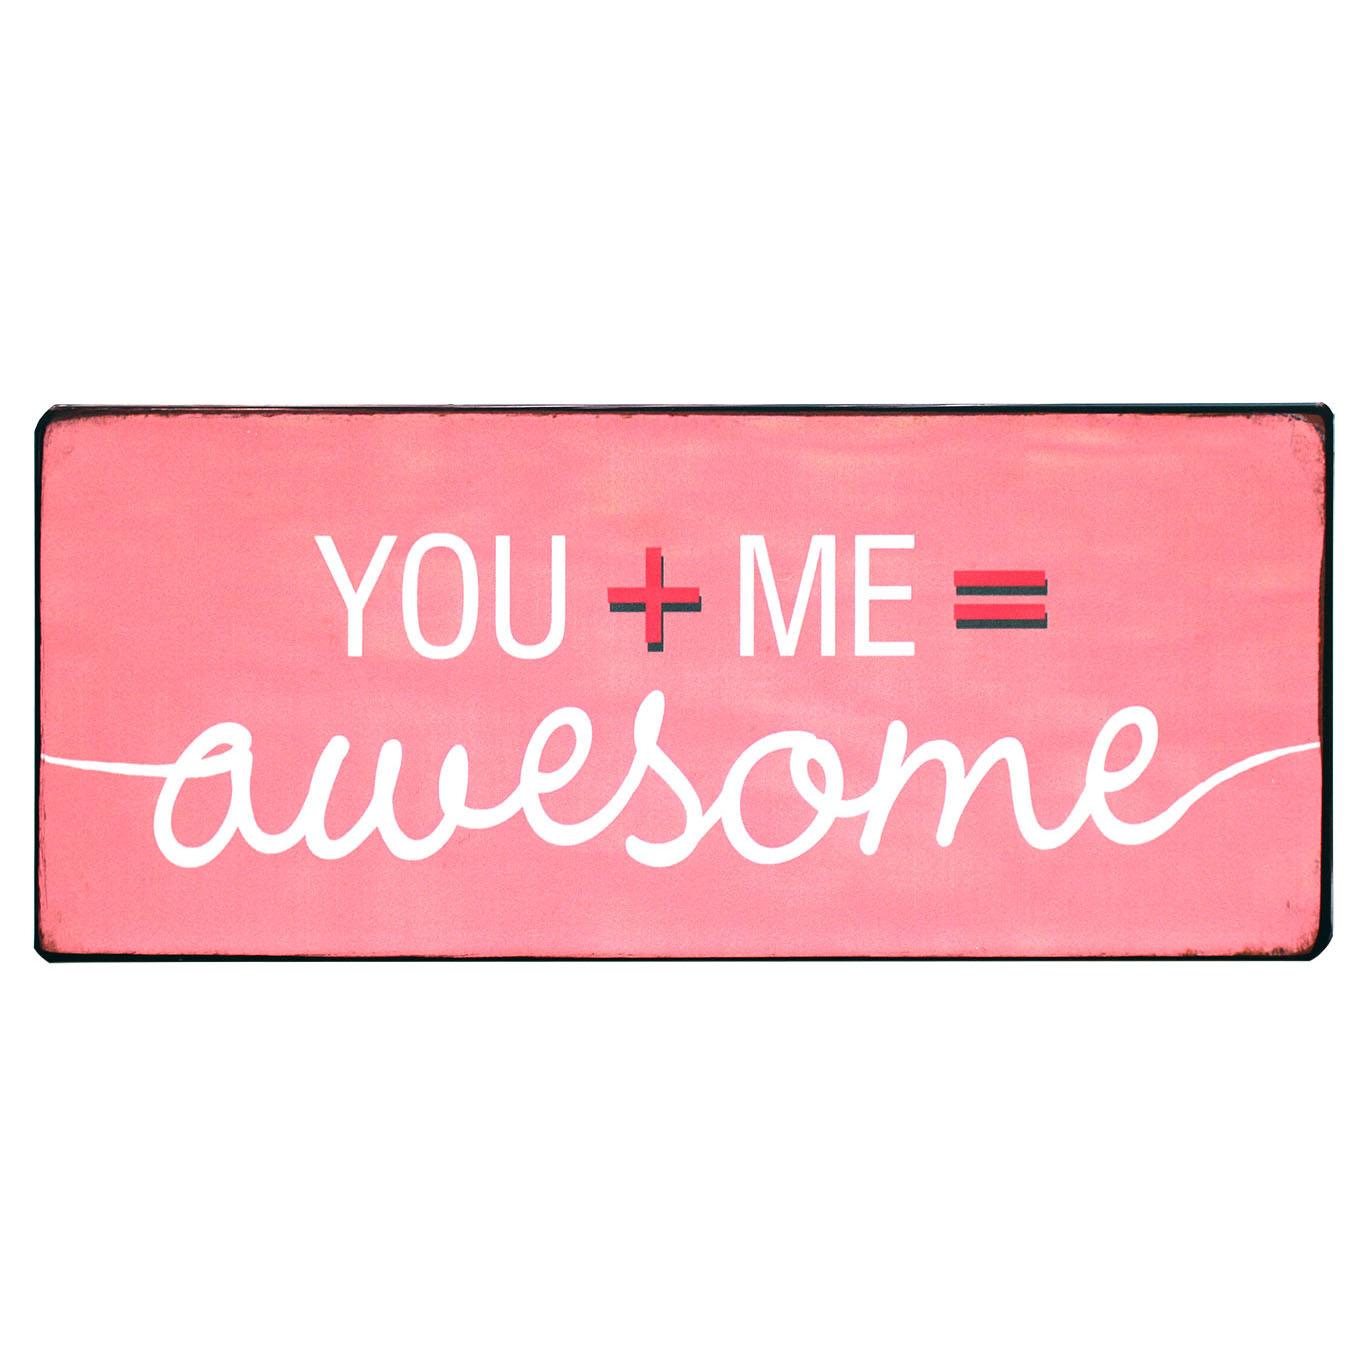 em4753-you-plus-me-is-awesome-spreukenbord-tekstbord-uitspraken-gezegde-spreuken-rustiek-tekst-bord-cadeau-kado-online-metaal v